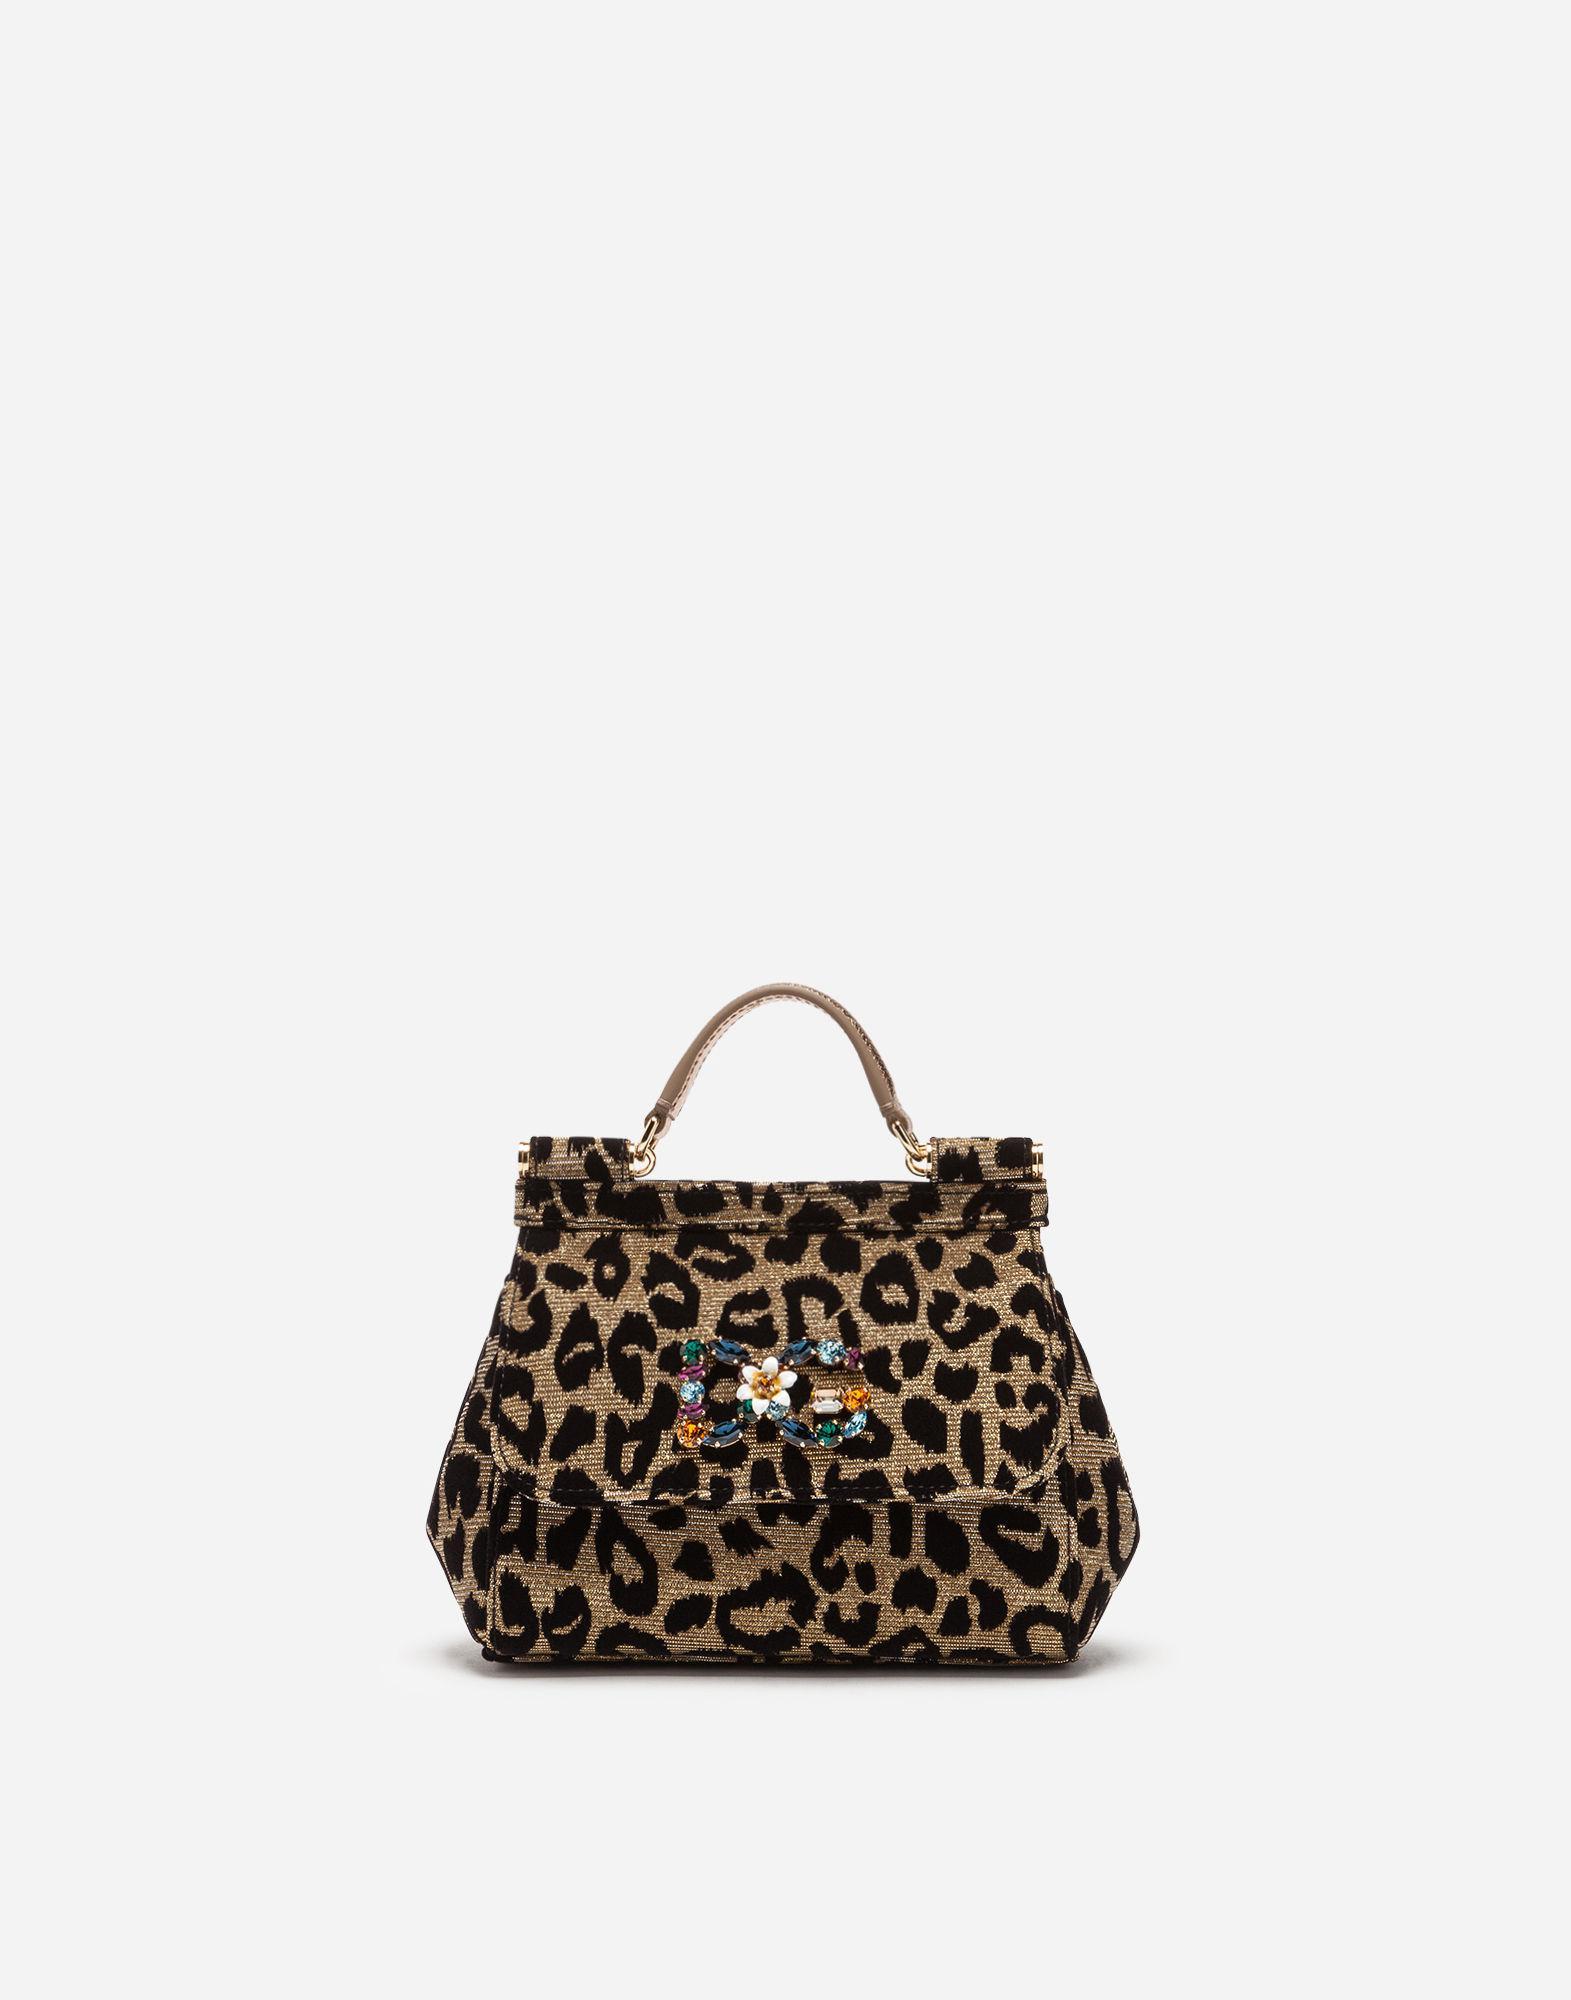 93d4baf09d16 Lyst - Dolce   Gabbana Mini Sicily Bag In Lurex Jacquard Fabric And ...